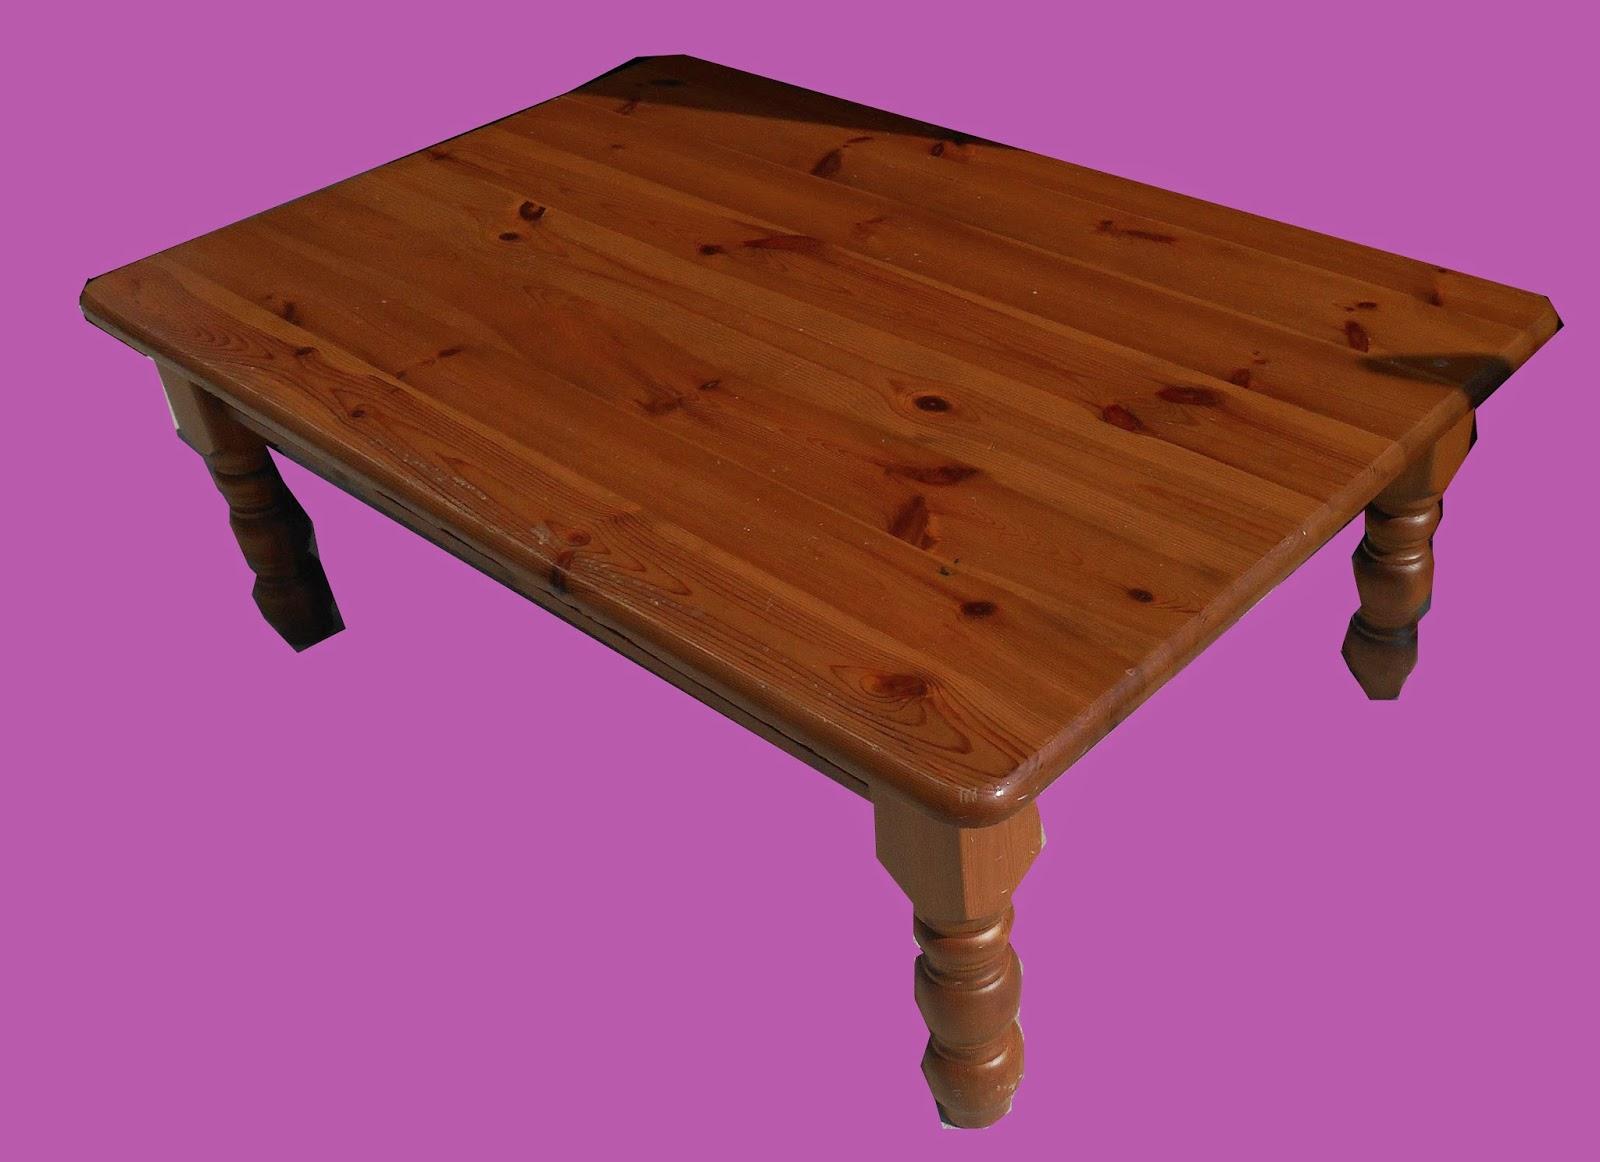 Uhuru Furniture Collectibles Large Pine Coffee Table 75 Sold